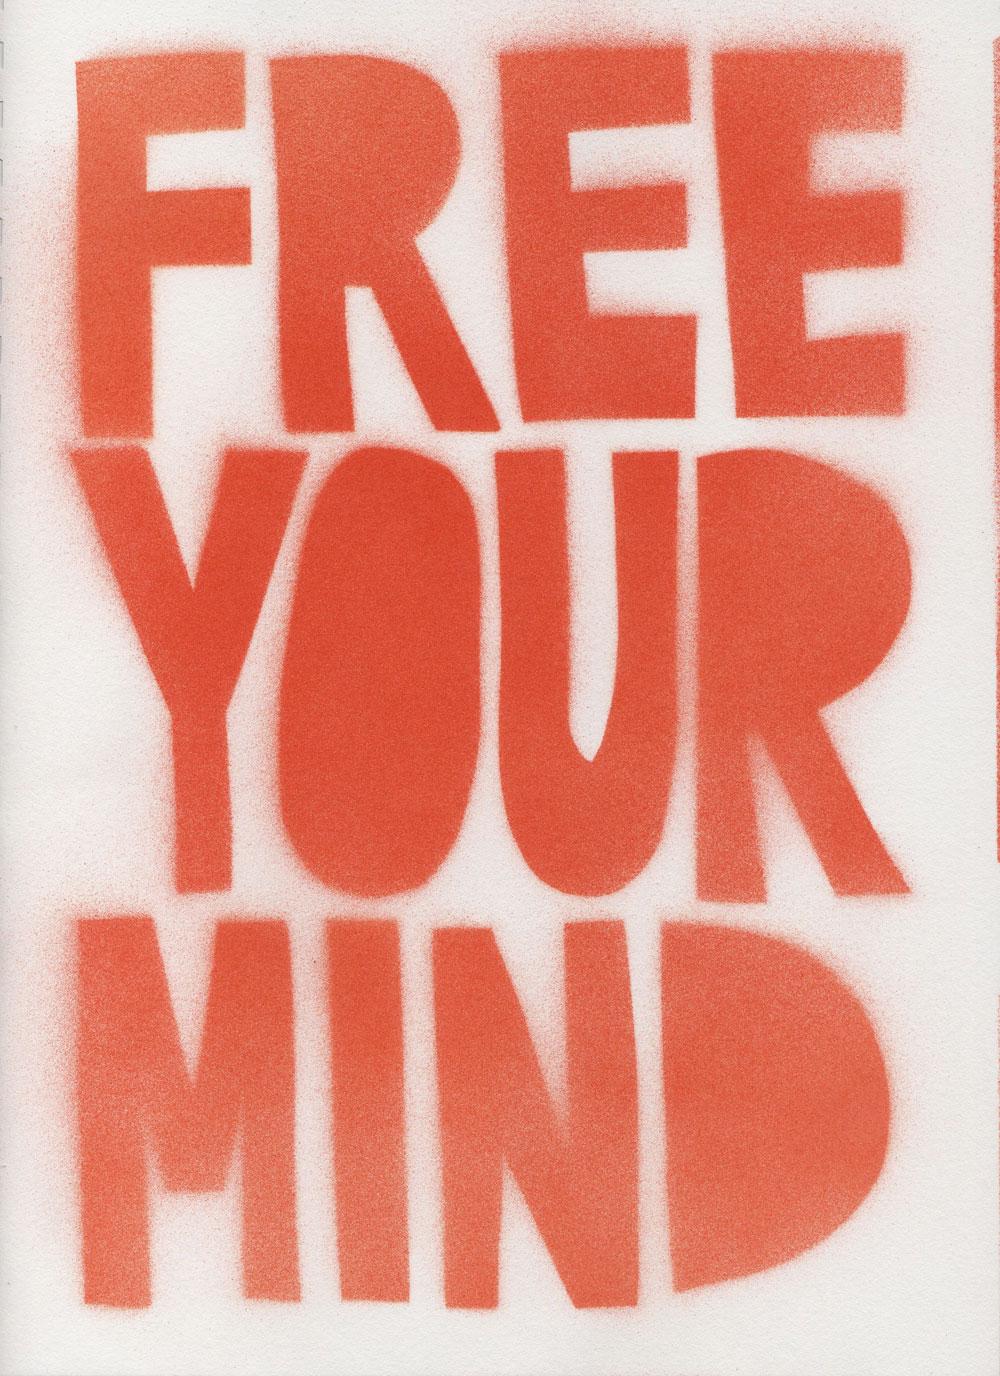 Free Your Mind T Shirt Design Process Soul Flower Blog